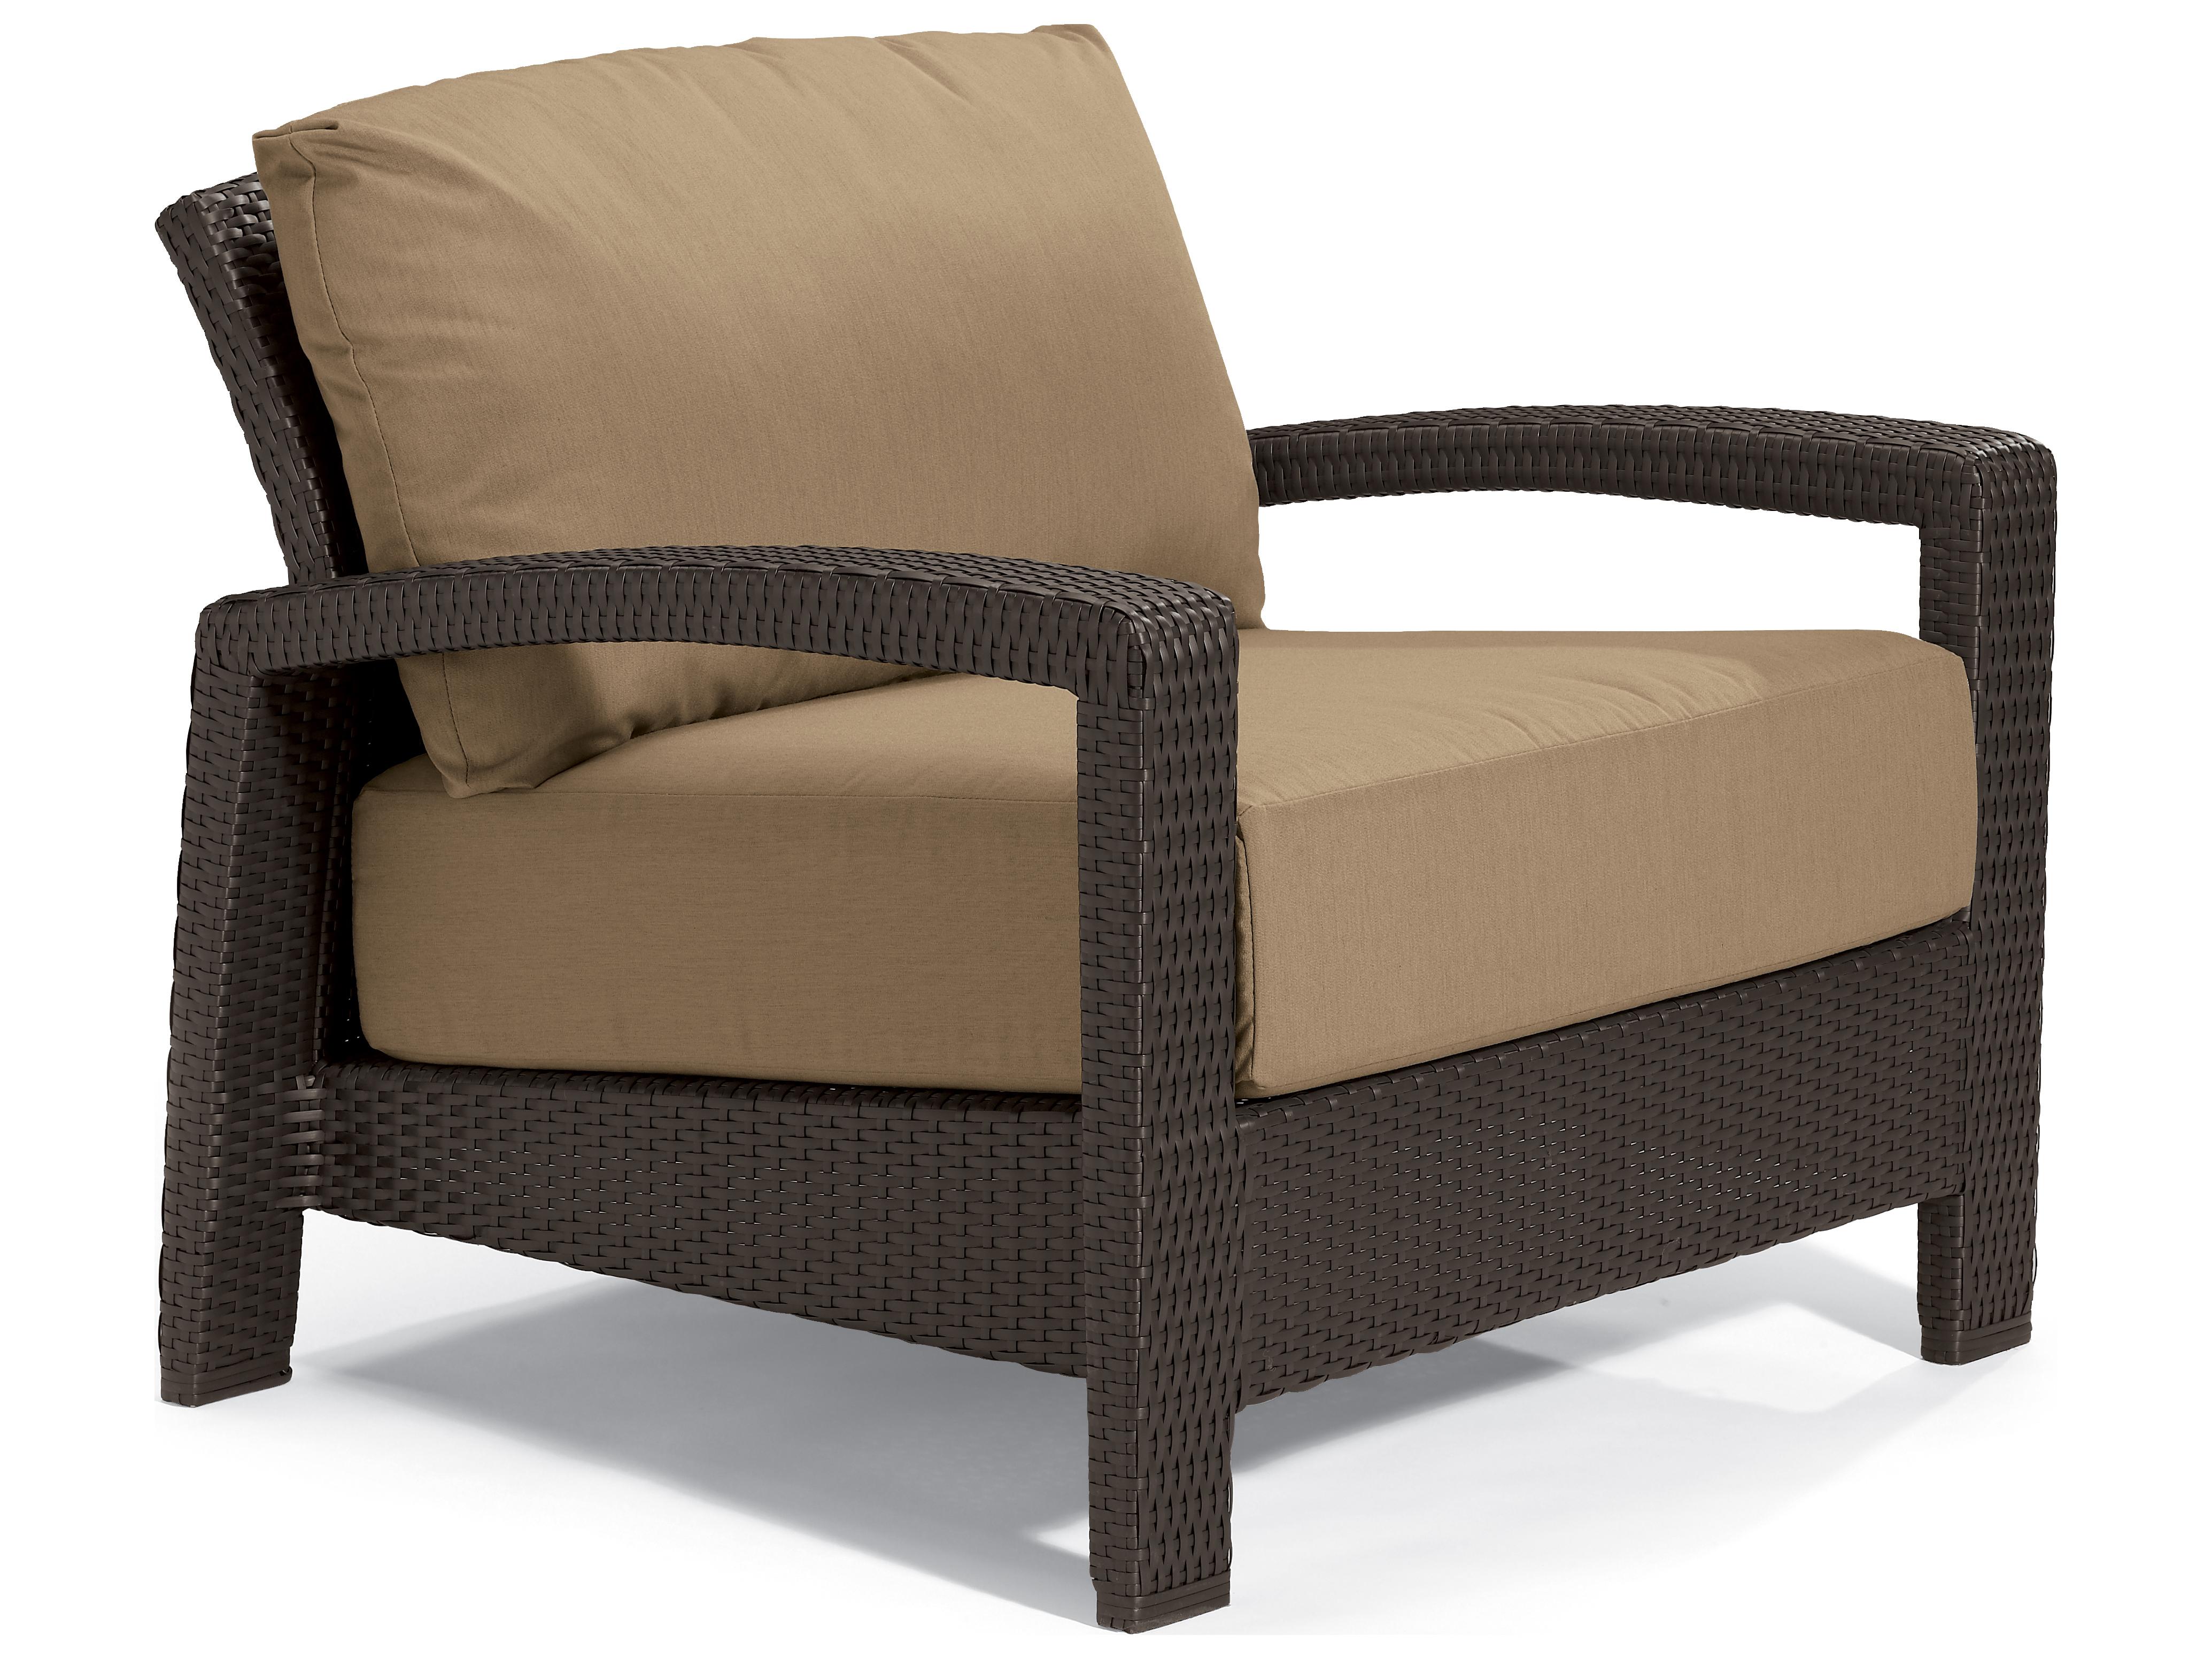 Tropitone Evo Woven Deep Seating Lounge Chair 360911ac